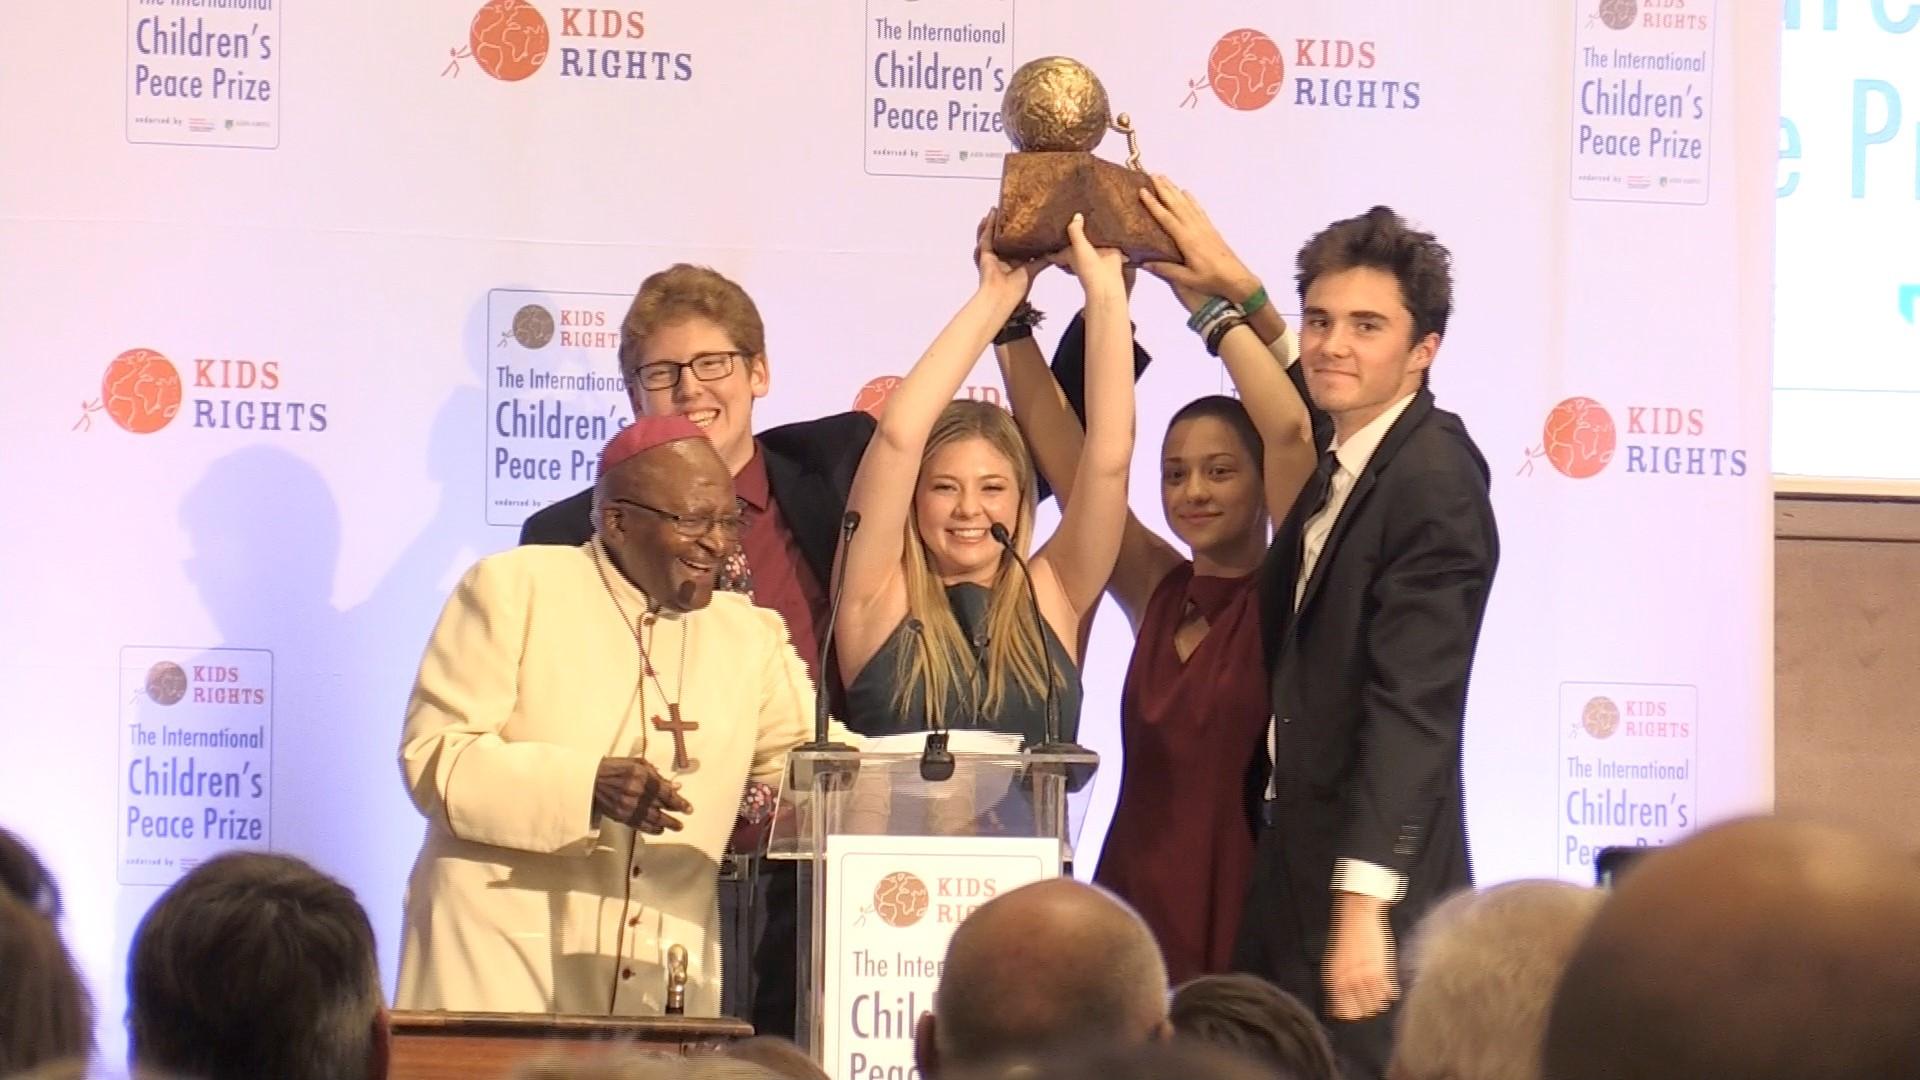 KidsRights International Kid's Peace Reward 2019 for People enhancing kids's rights.